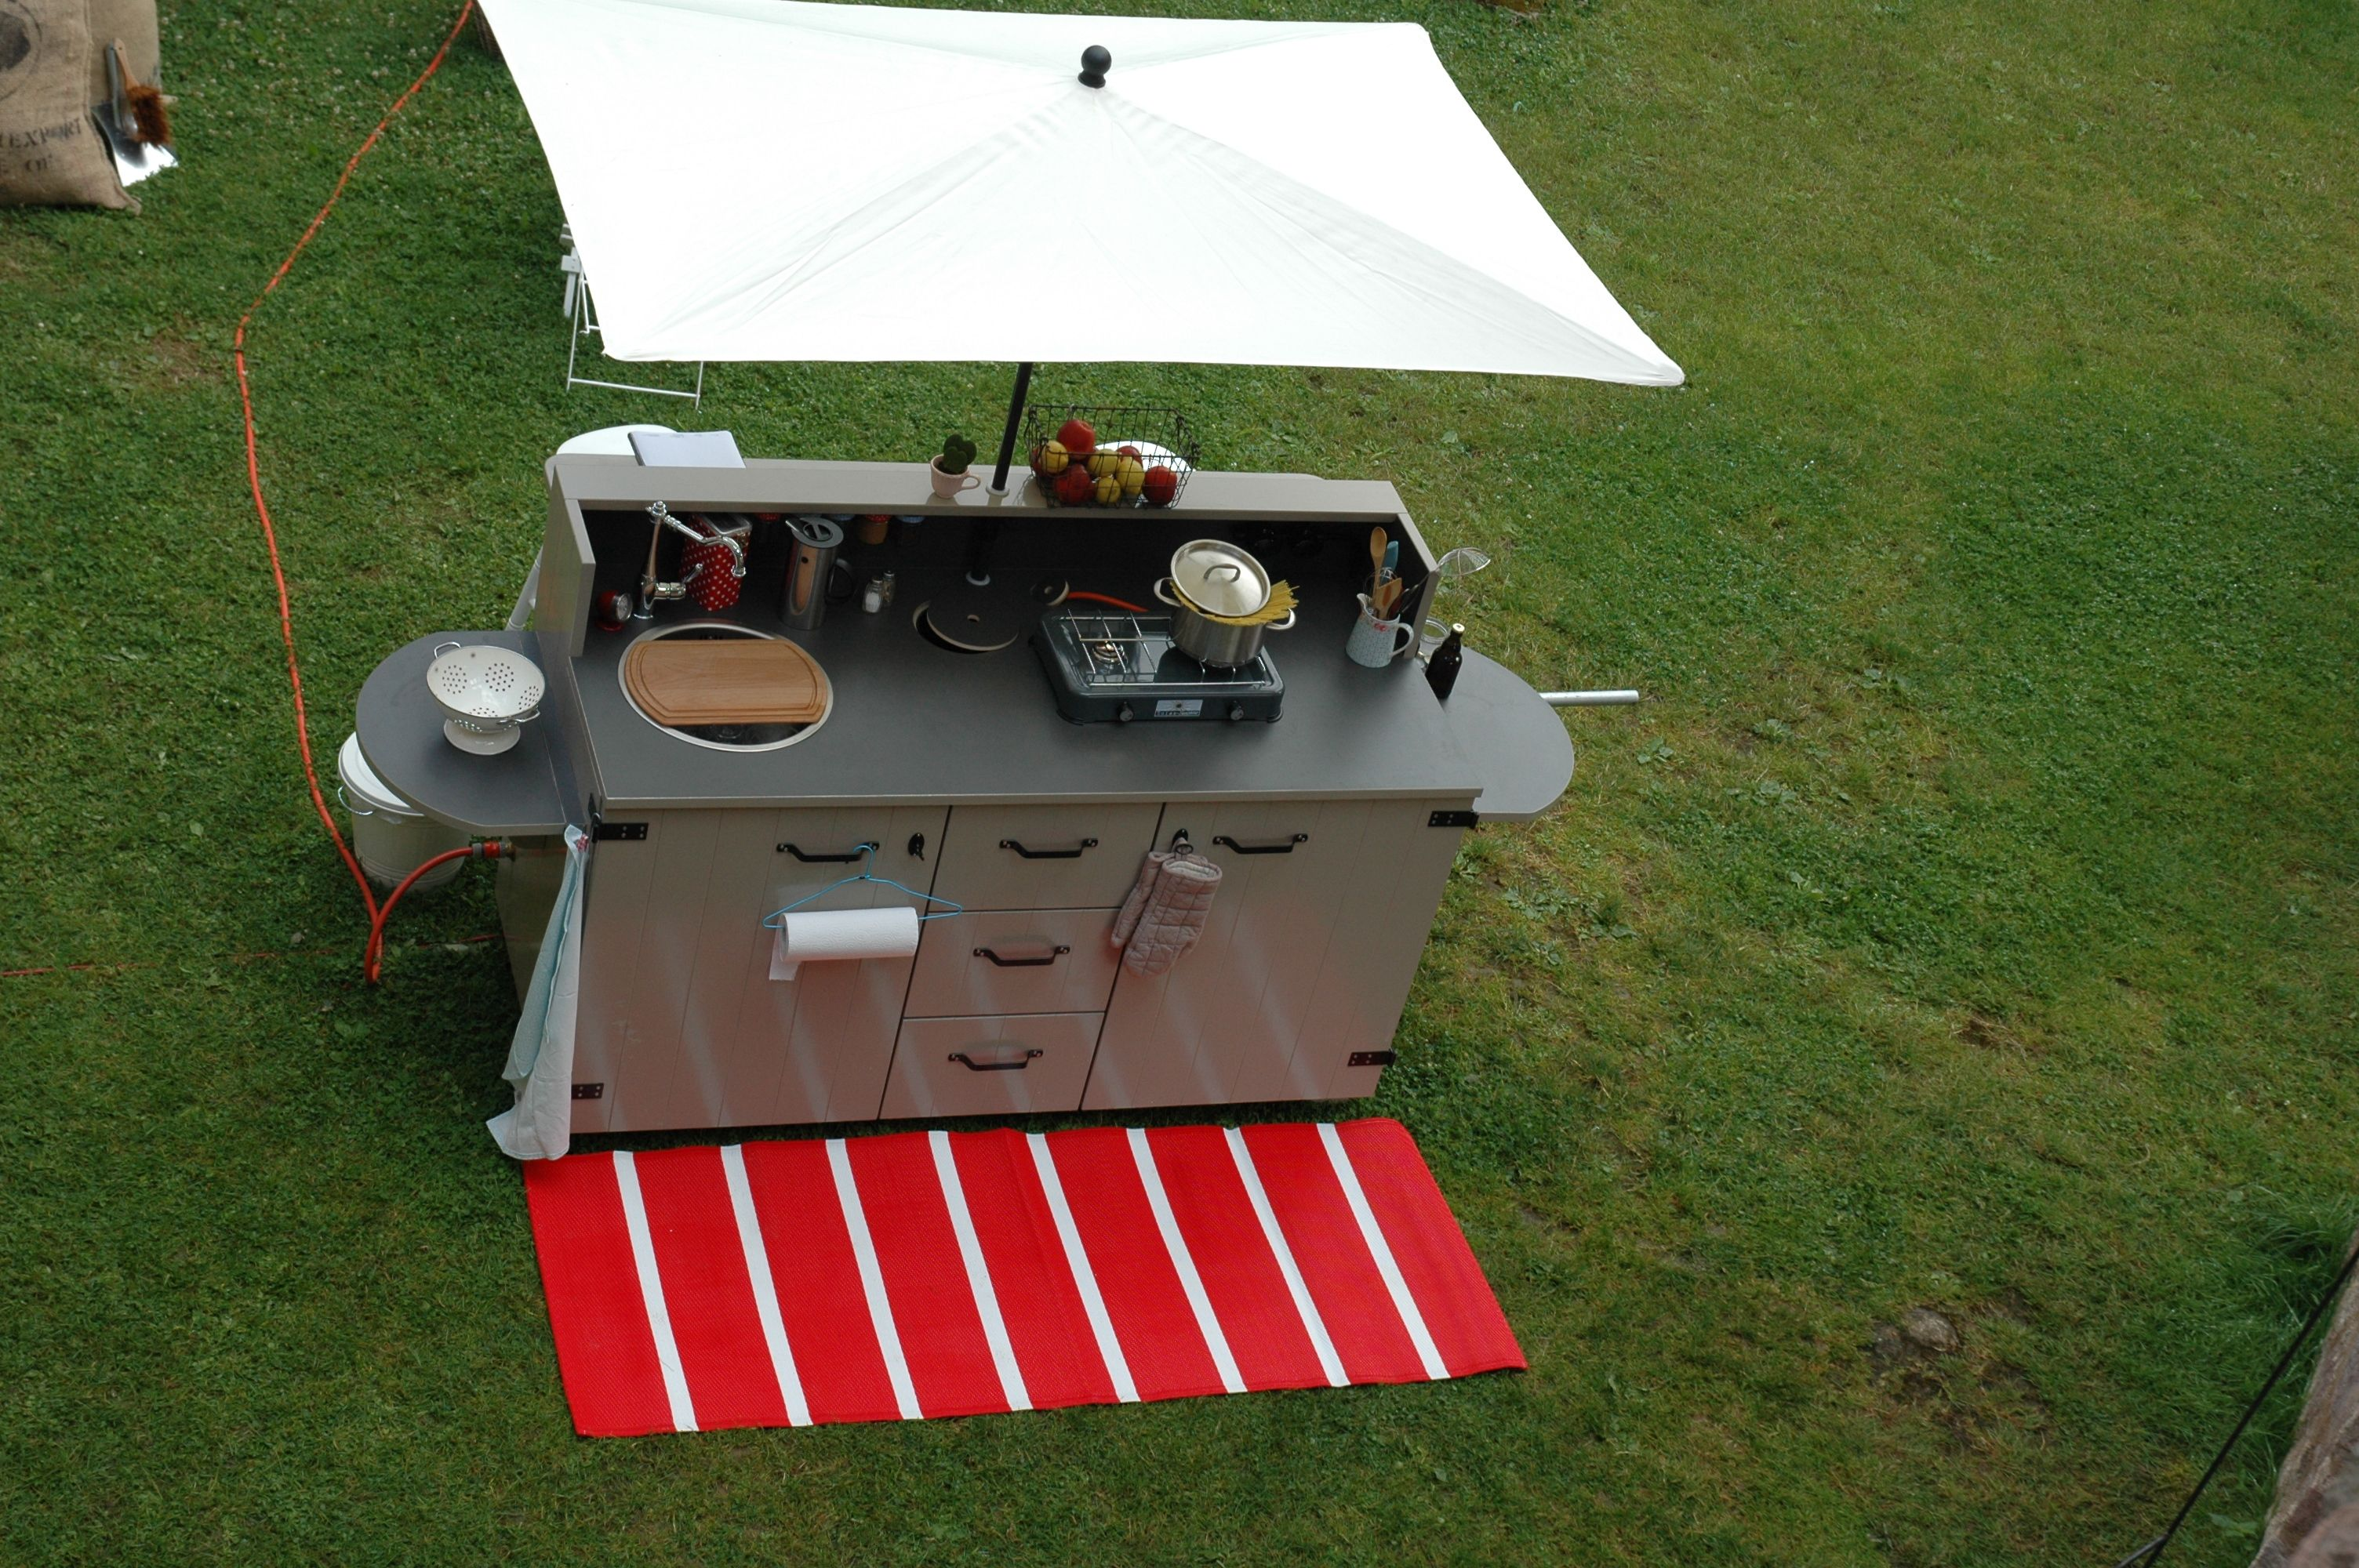 Outdoor Küche Klappbar : Bestellung unter info openairliving maxi mobile outdoor küche